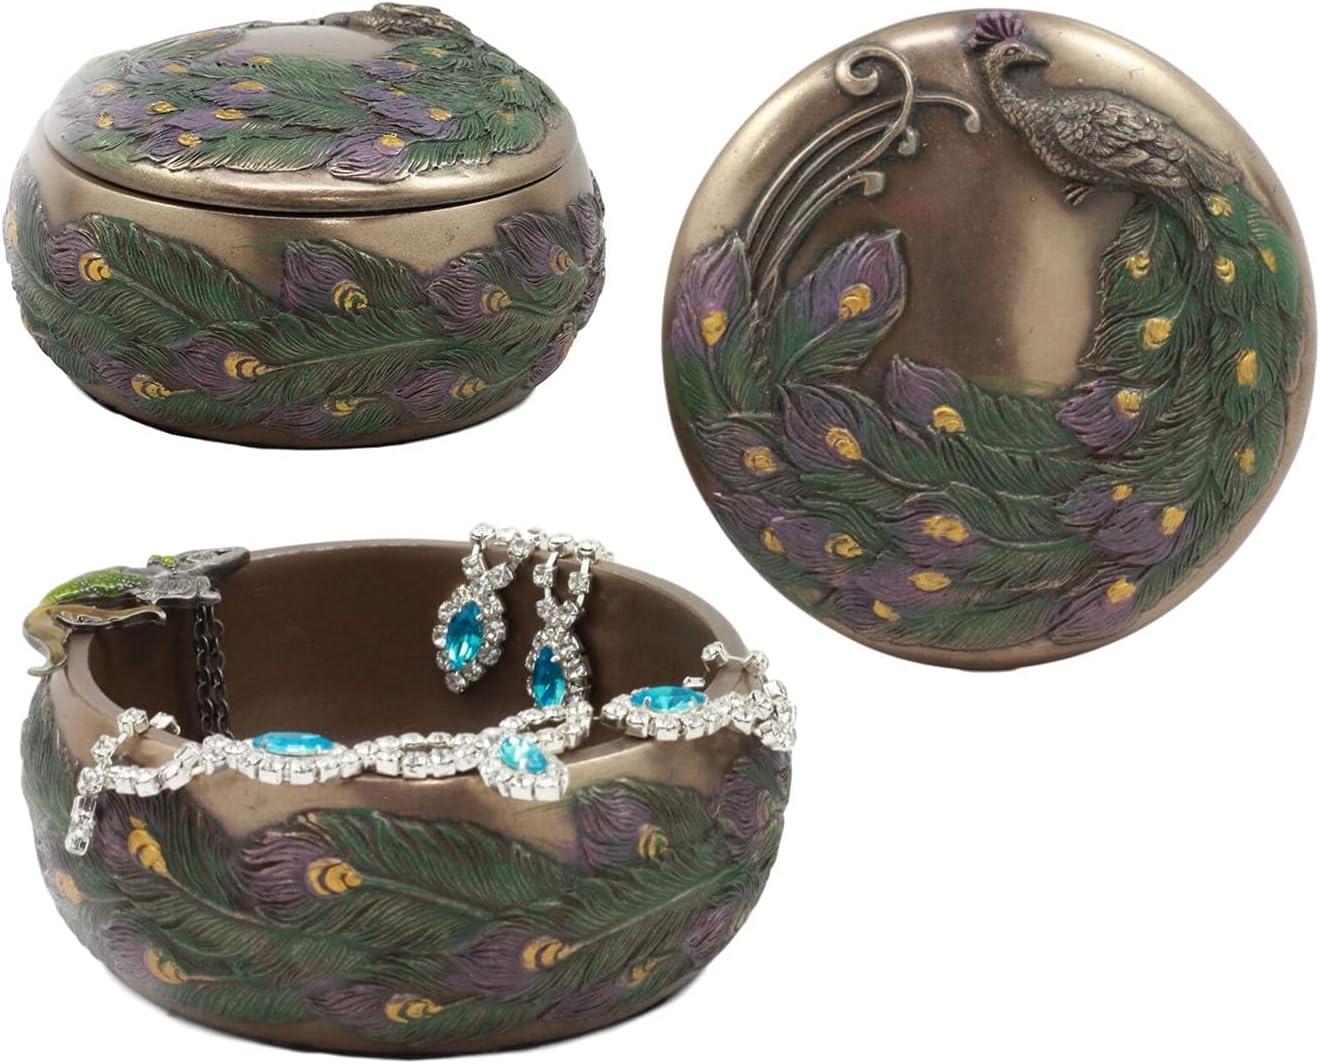 New Beautiful Iridescent Tailed Max 40% OFF Peacock Box Jewelry Round Figuri Dealing full price reduction